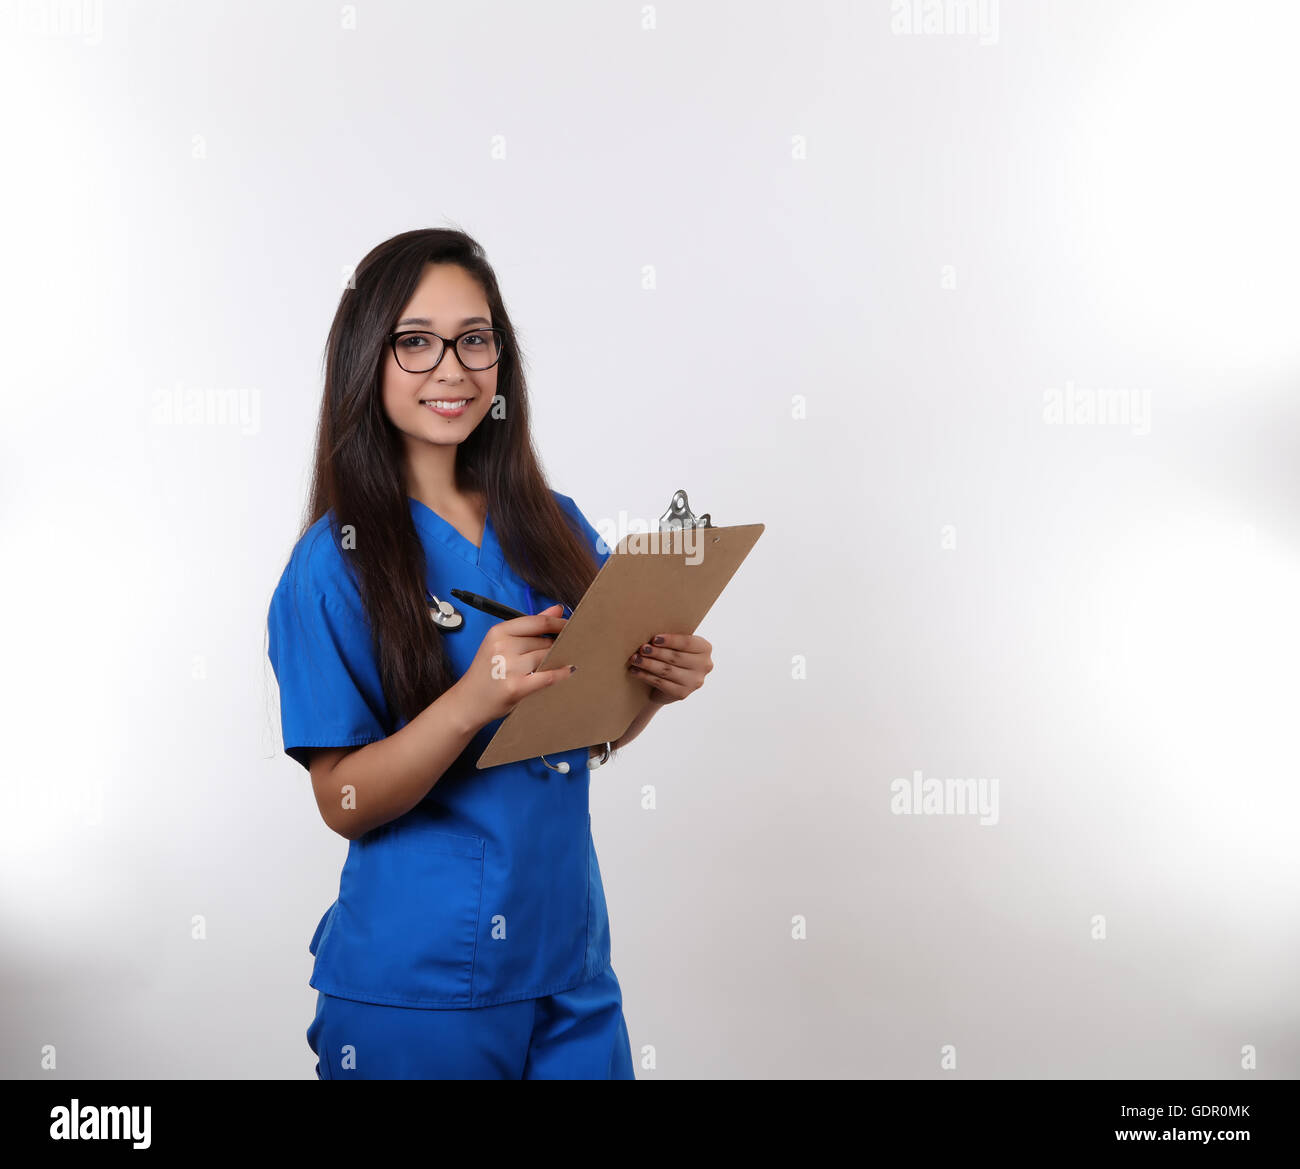 A young hispanic nurse in blue scrubs wearing glasses. Stock Photo